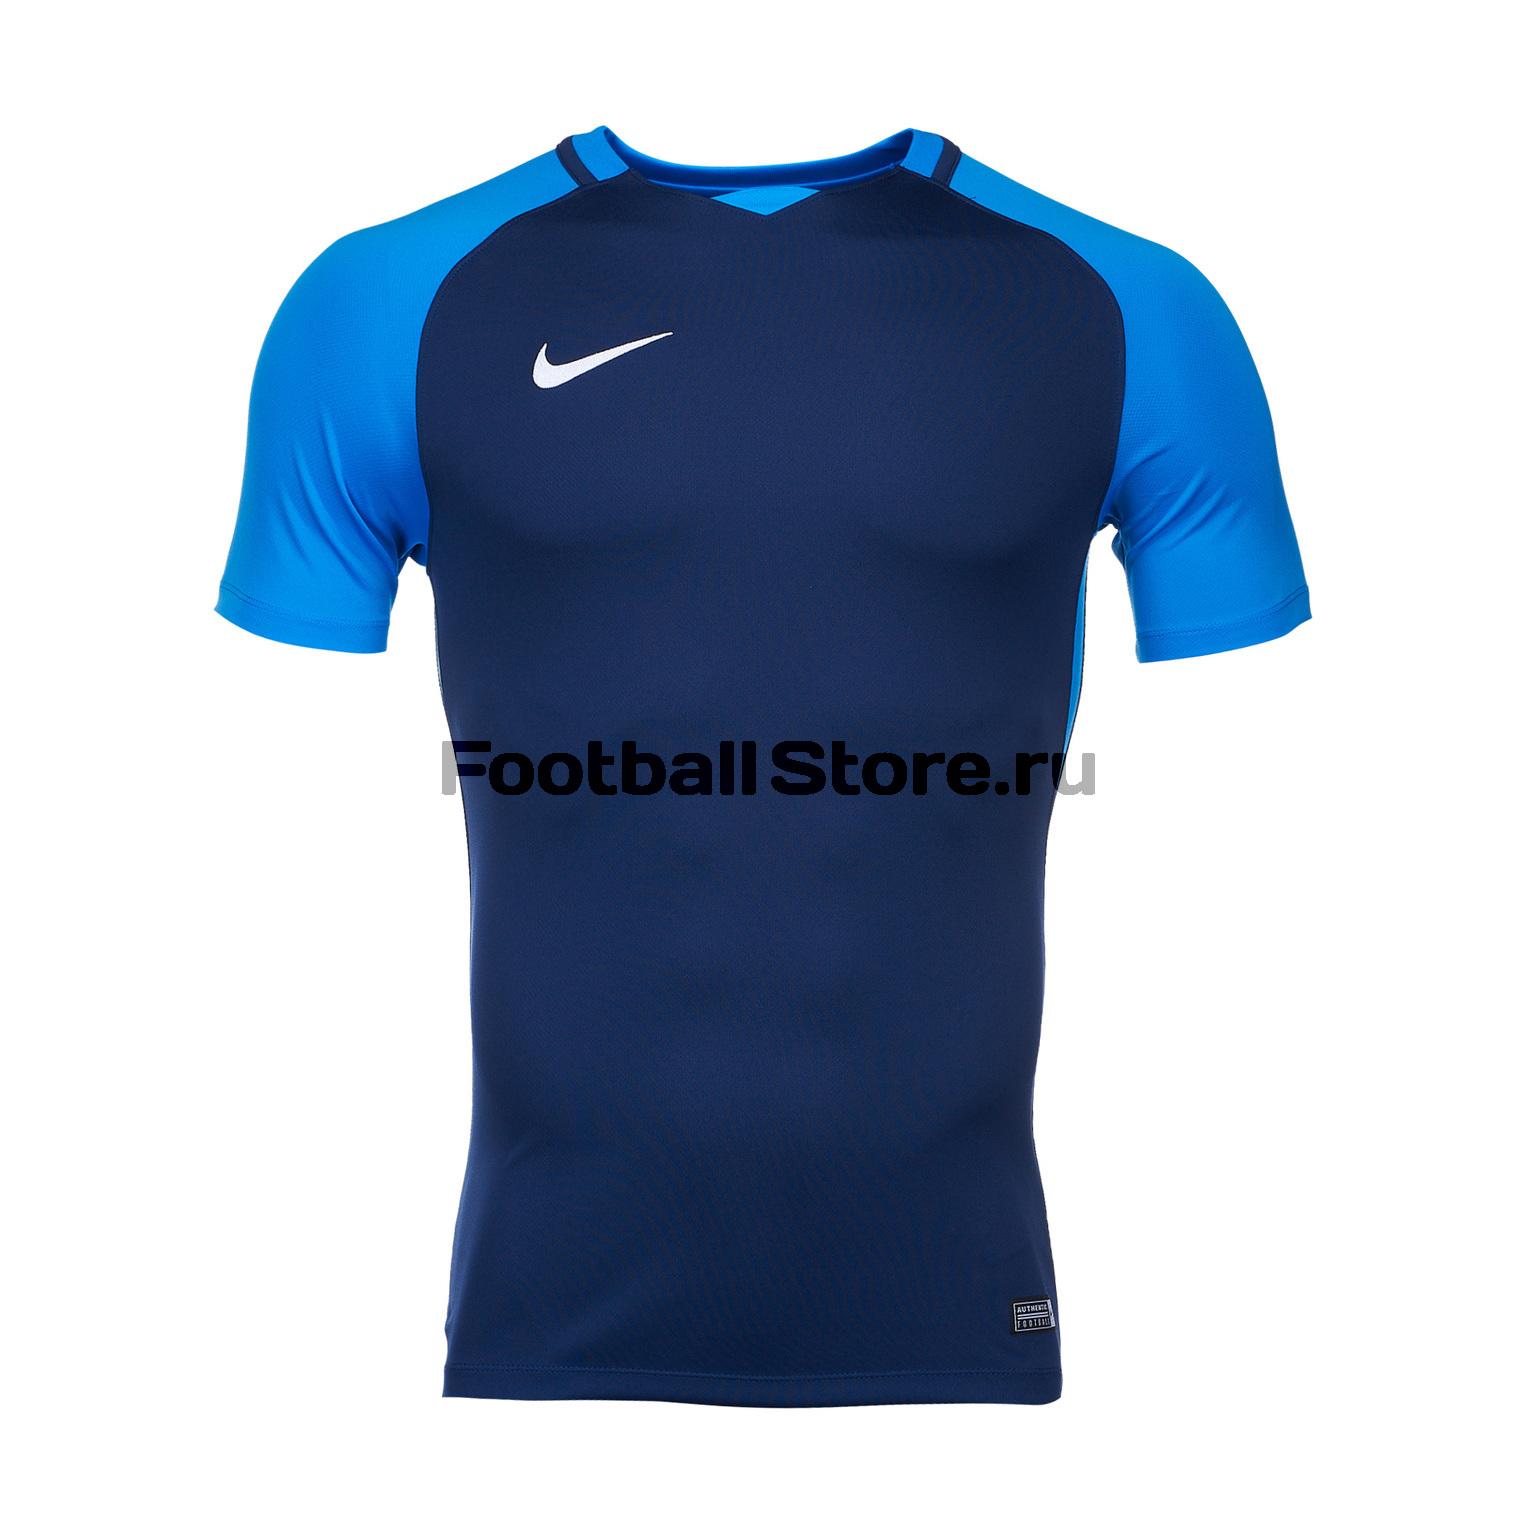 Футболки Nike Футболка игровая Nike Trophy III 881483-411 игровая форма nike футболка детская nike ss precision iii jsy boys 645918 410